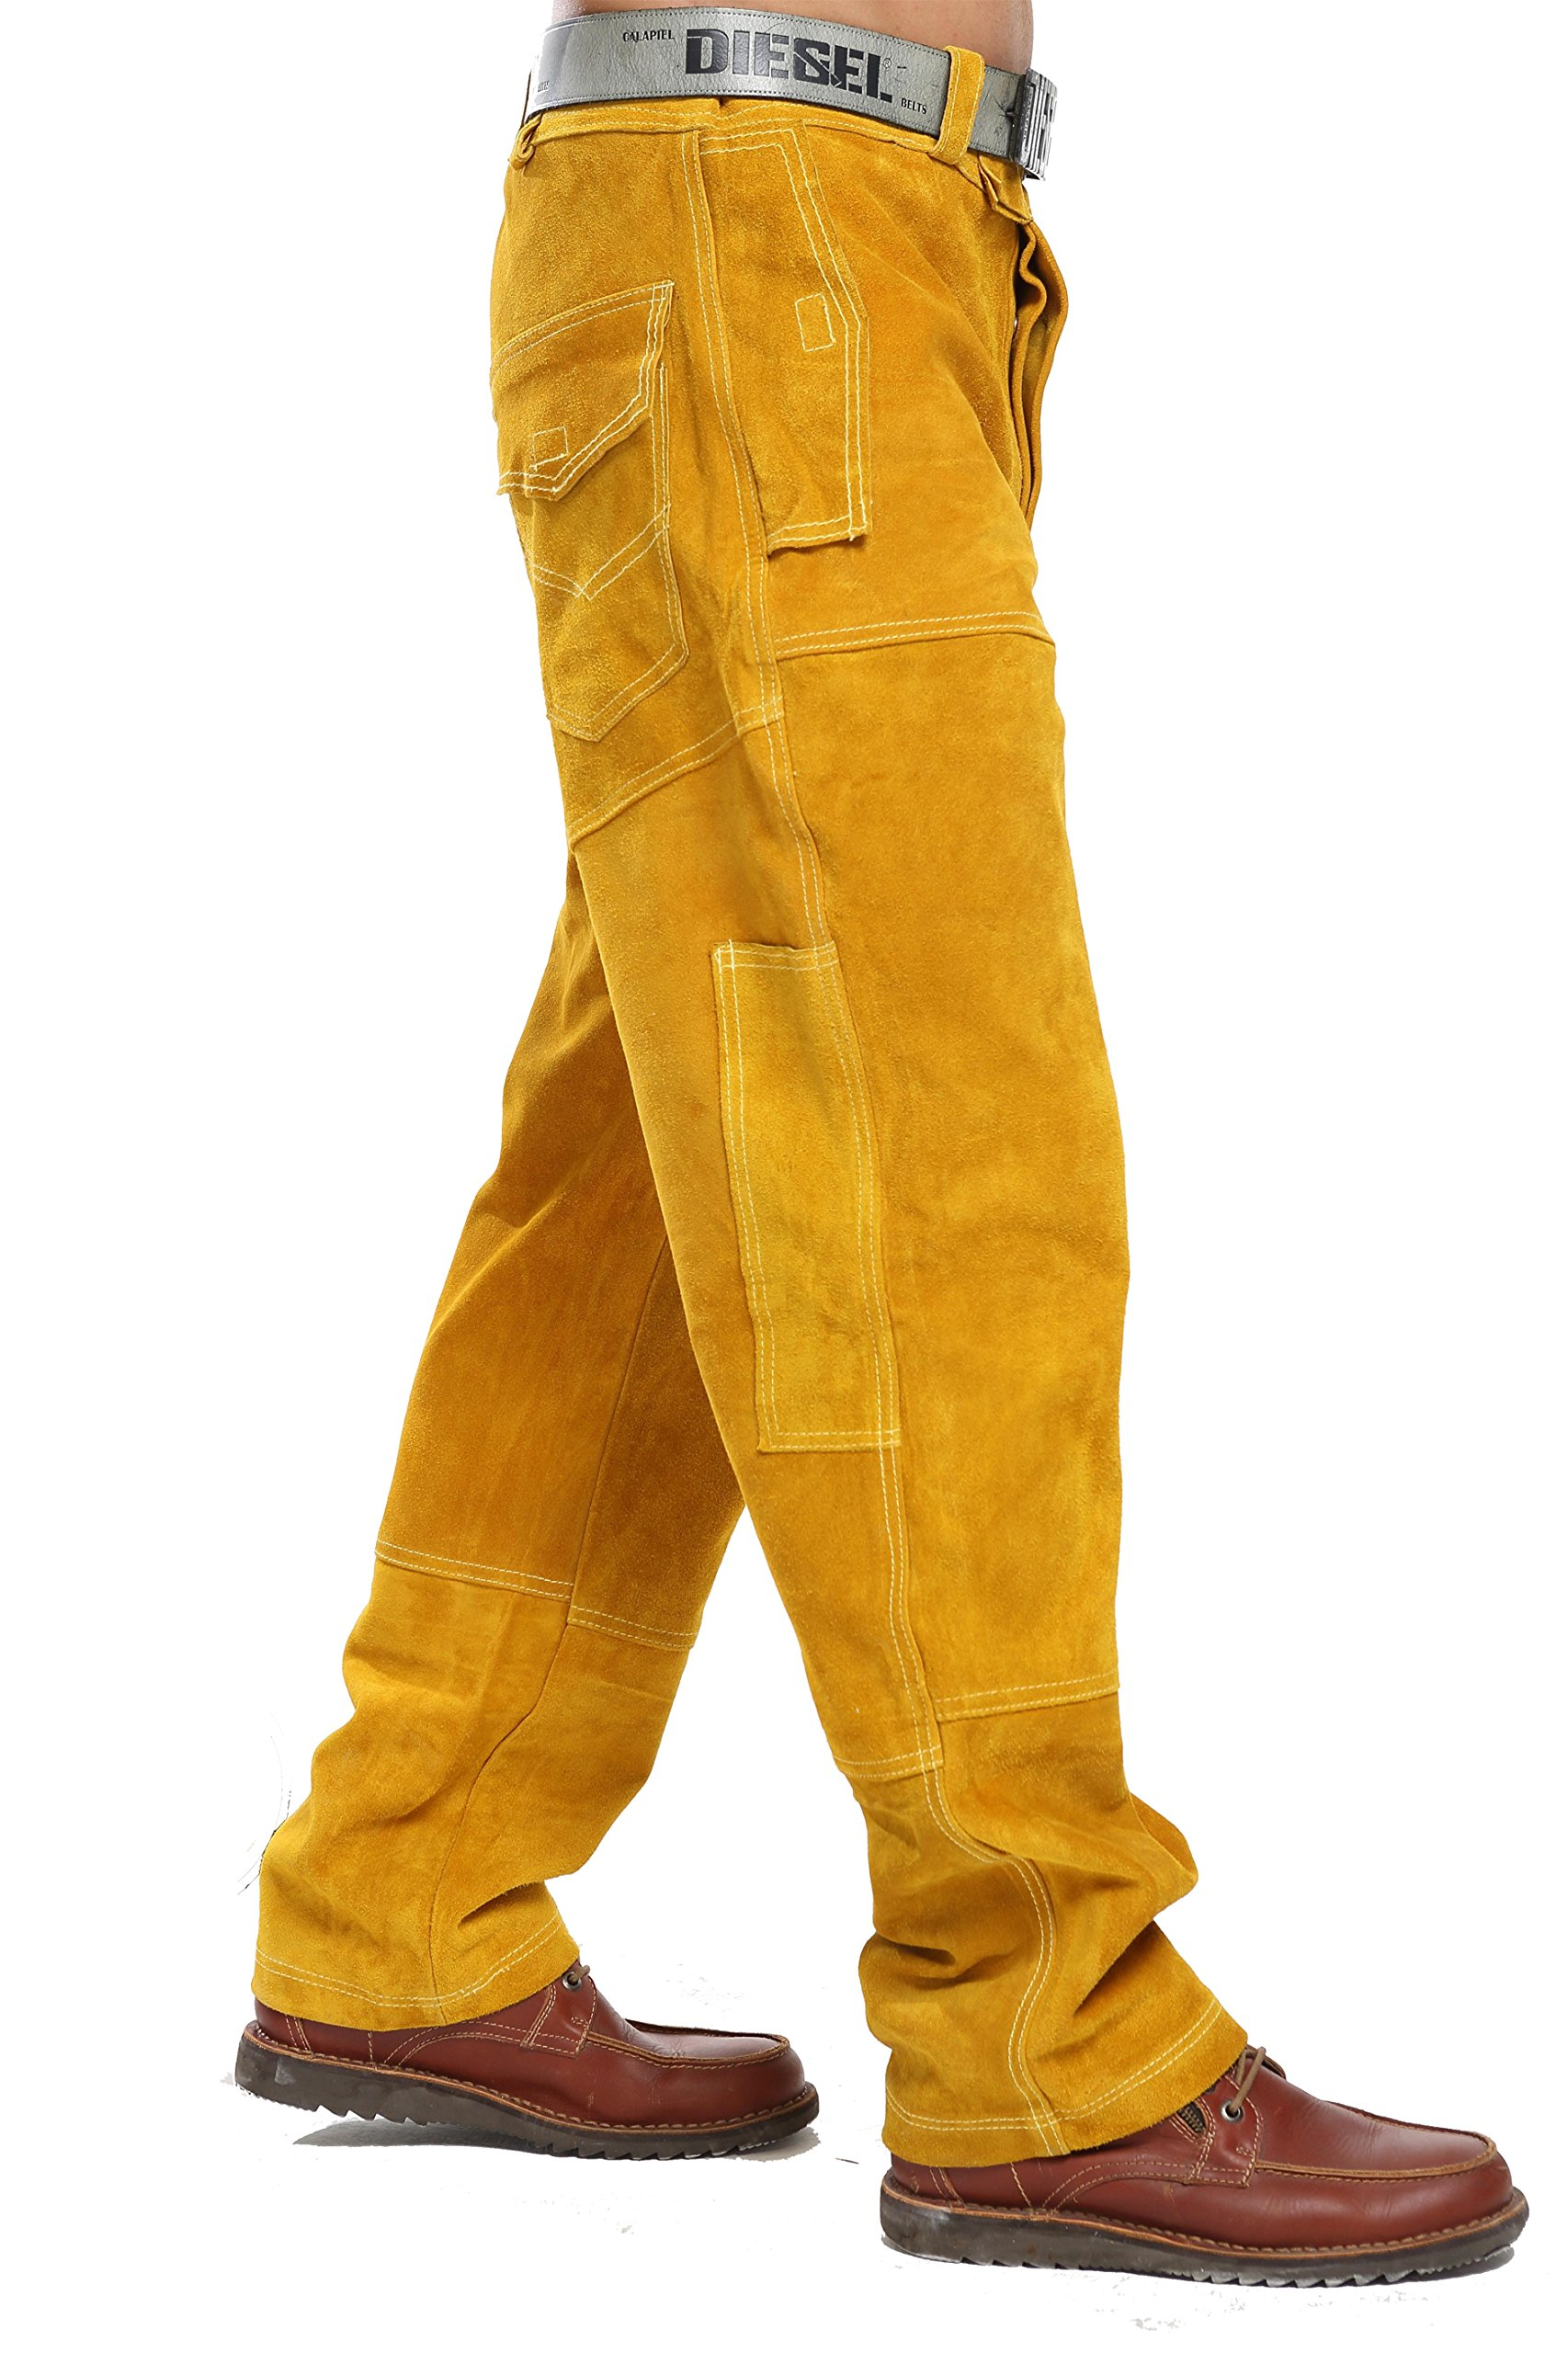 Welding protective pants | welding clothes | leather pants (L)